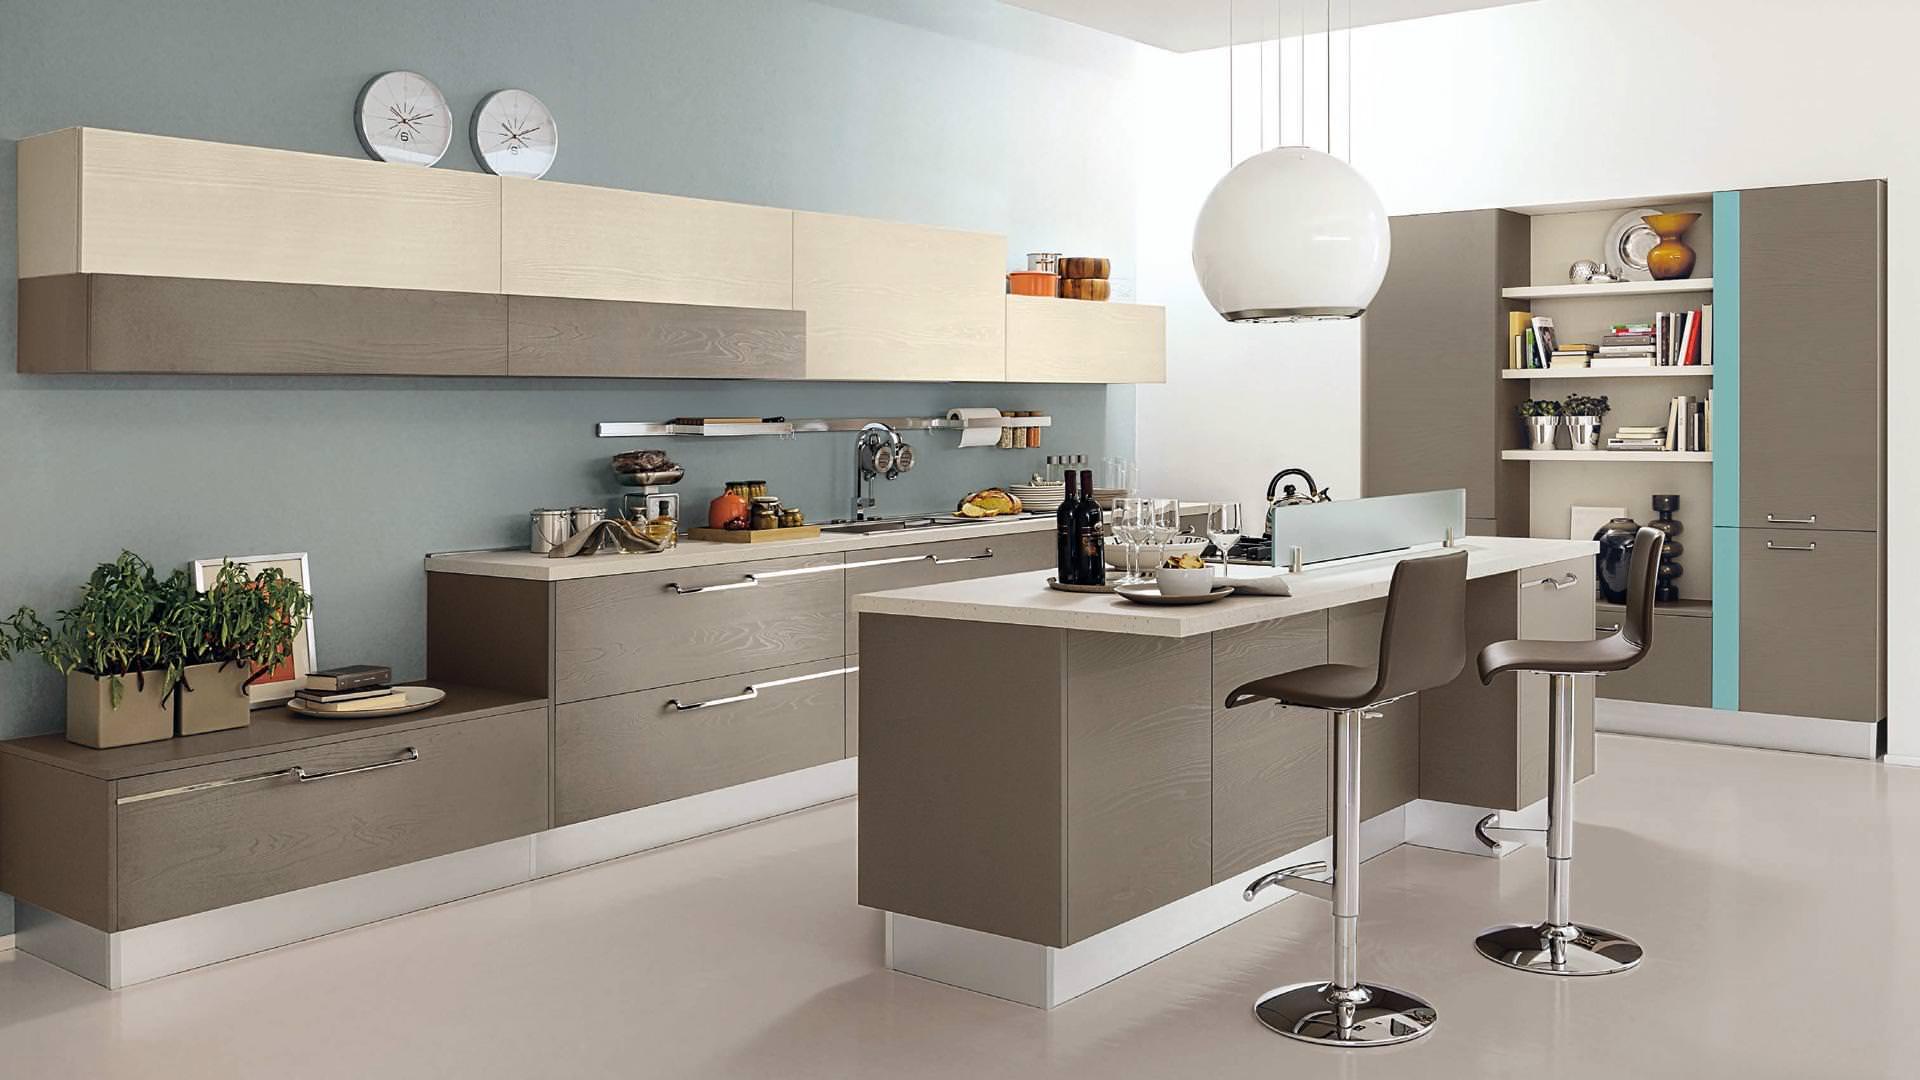 Cucine industriali for Cucine industriali